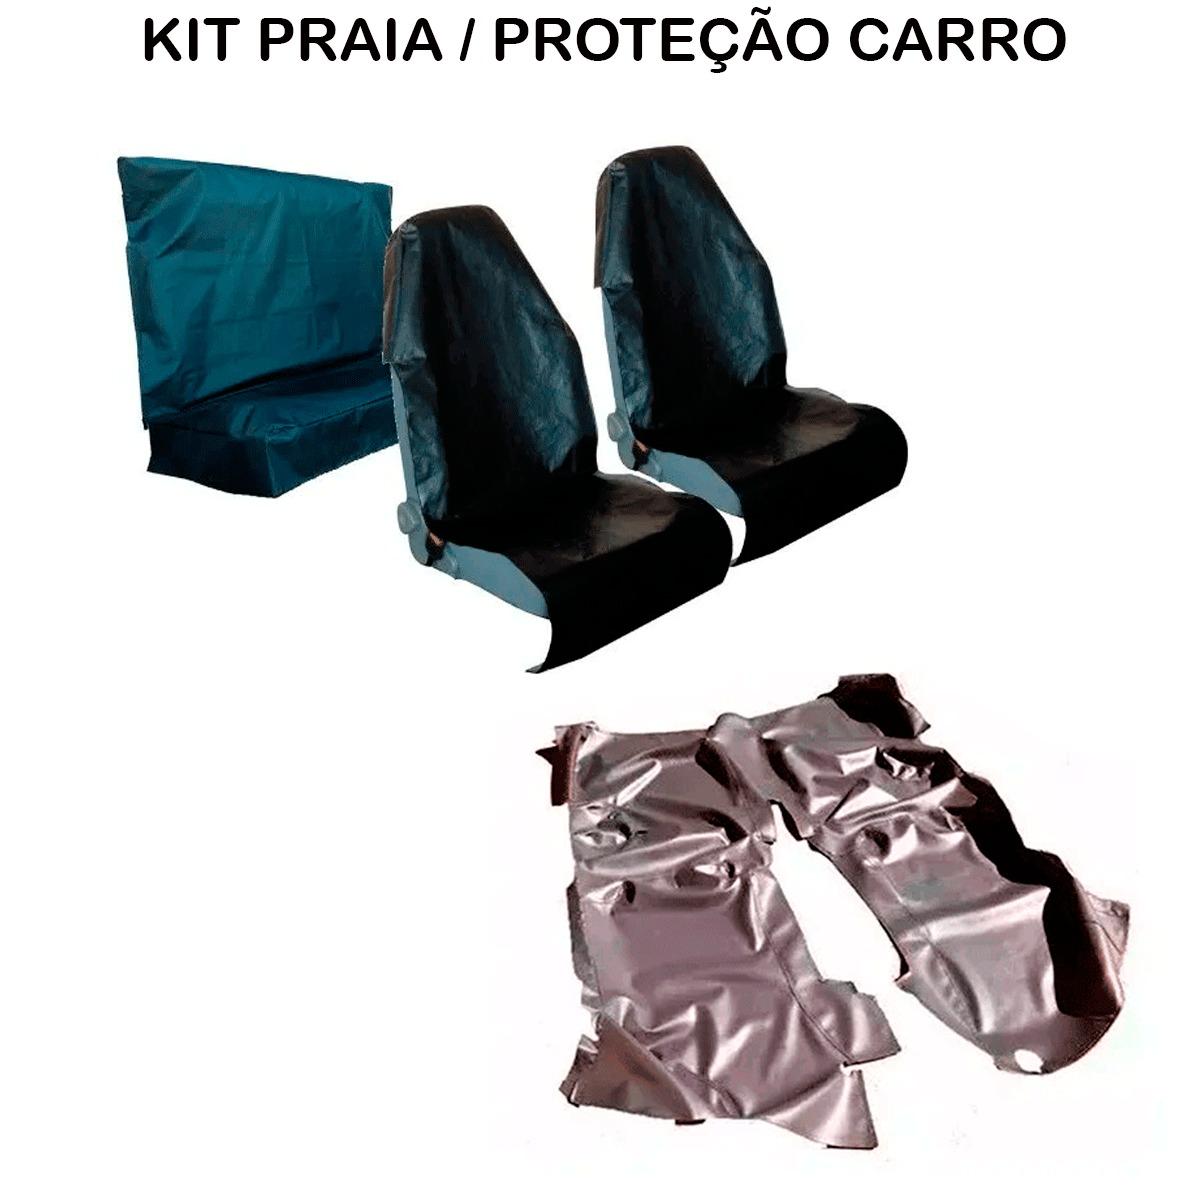 Tapete Em Vinil Mitsubishi Pajero TR4 2003 a 2014 + Capa Banco Protecao Banco Areia Suor Academia